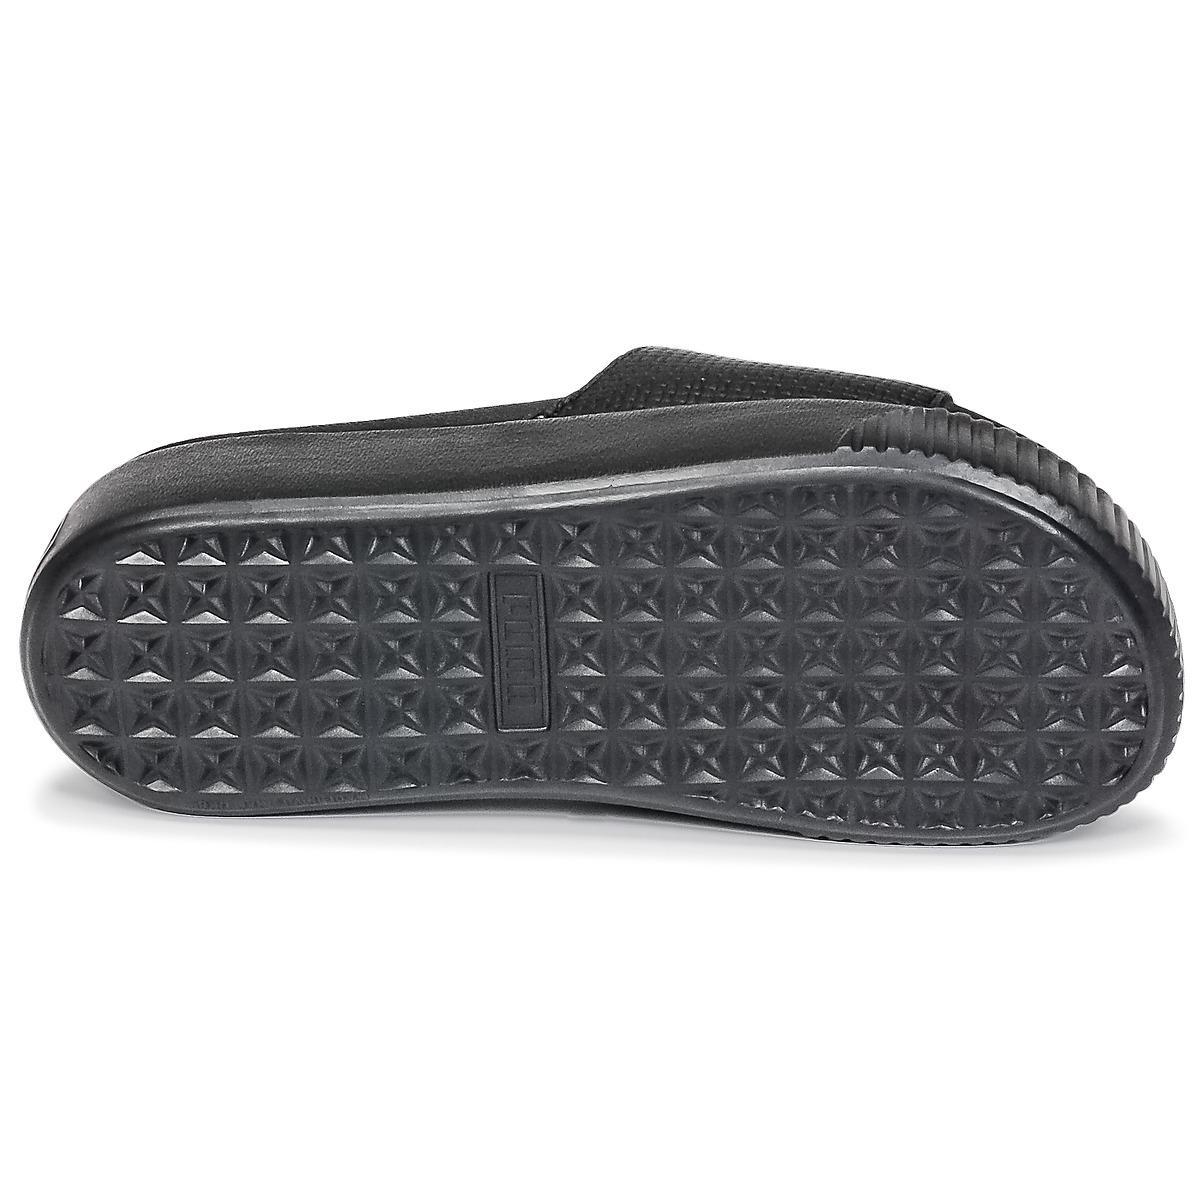 2c239de1e5d PUMA - Platform Slide Wns Ep Women s Mules   Casual Shoes In Black - Lyst.  View fullscreen